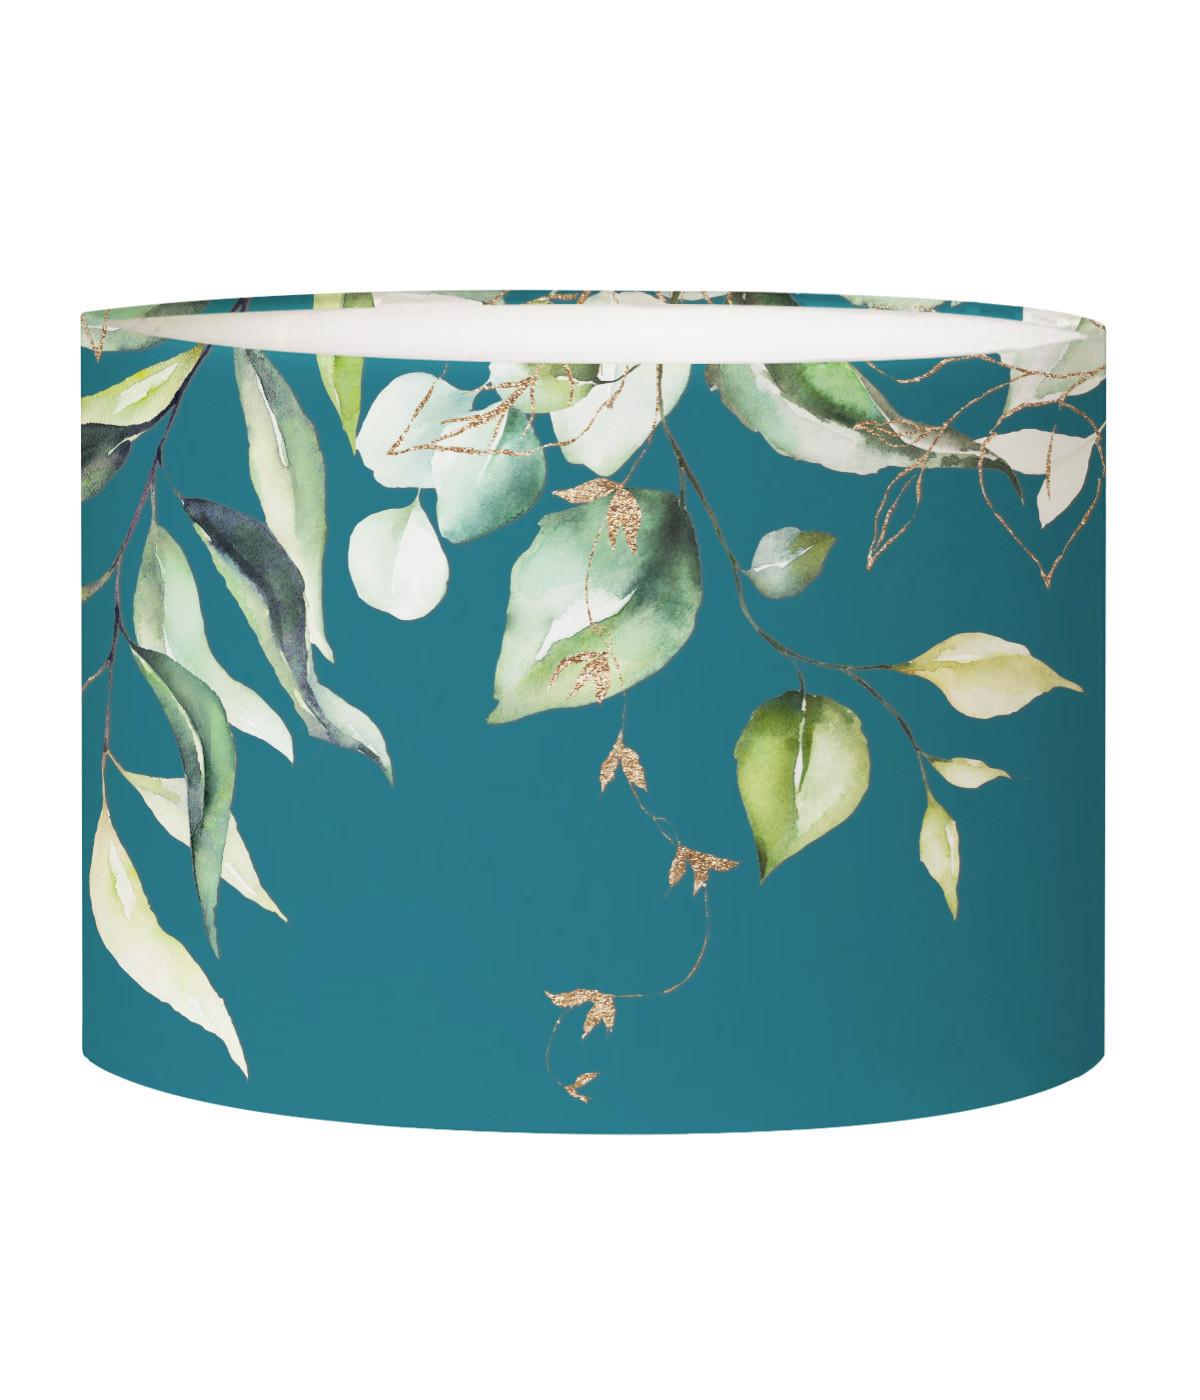 Abat-jour lampadaire bleu canard d 45 cm